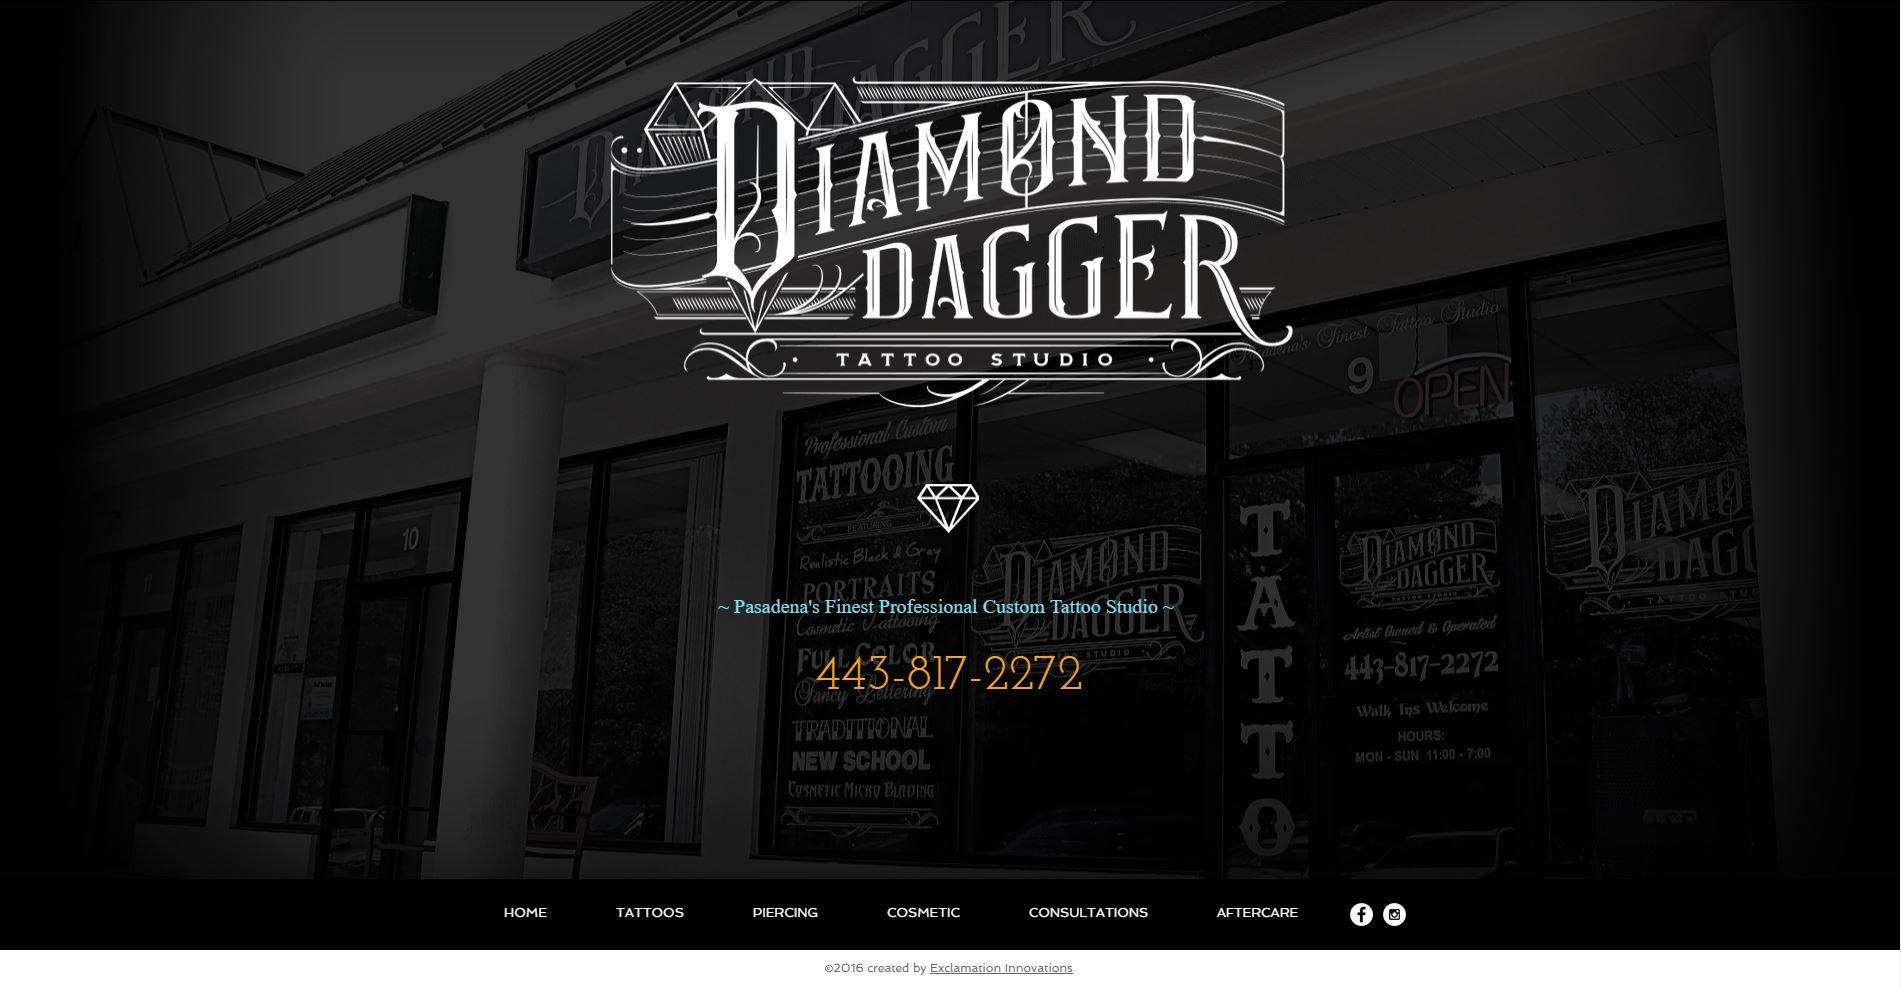 Diamond Dagger Tattoo Studio